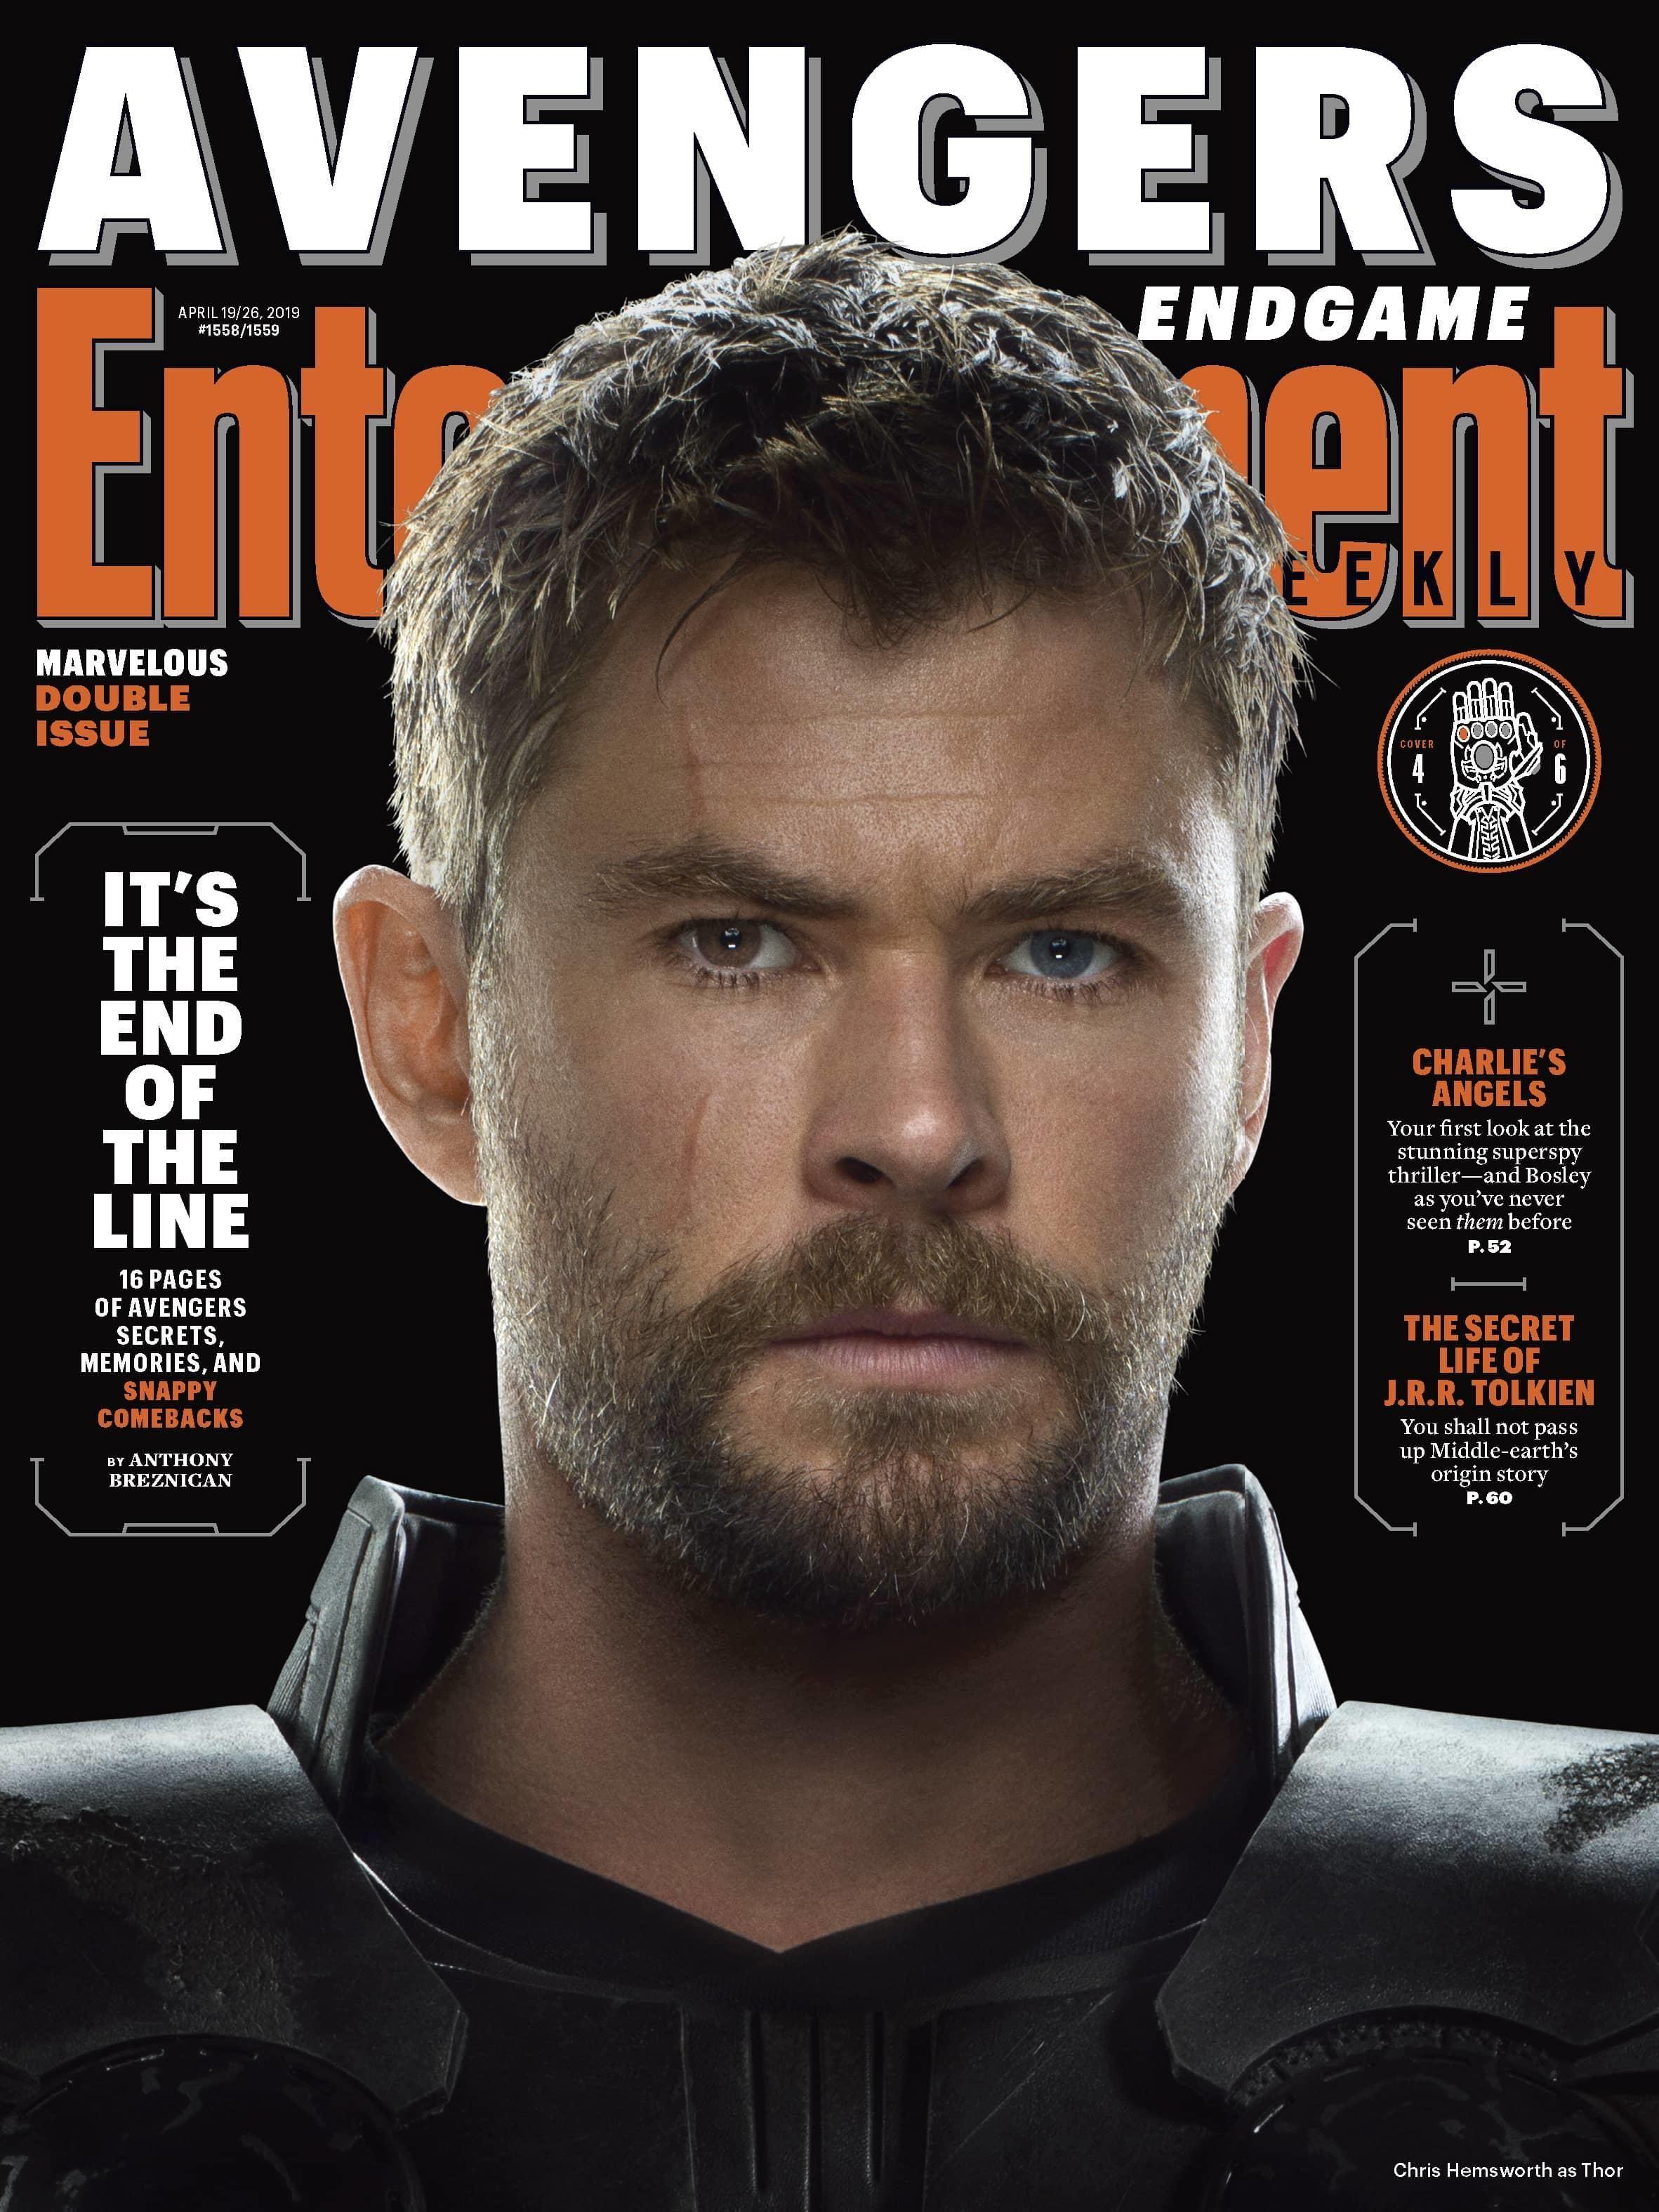 Entertainment Weekly Reveals Avengers Endgame Covers   Entertainment Weekly Reveals Avengers Endgame Covers Marvel Entertainment Weekly enthüllt Avengers Endgame Cov...